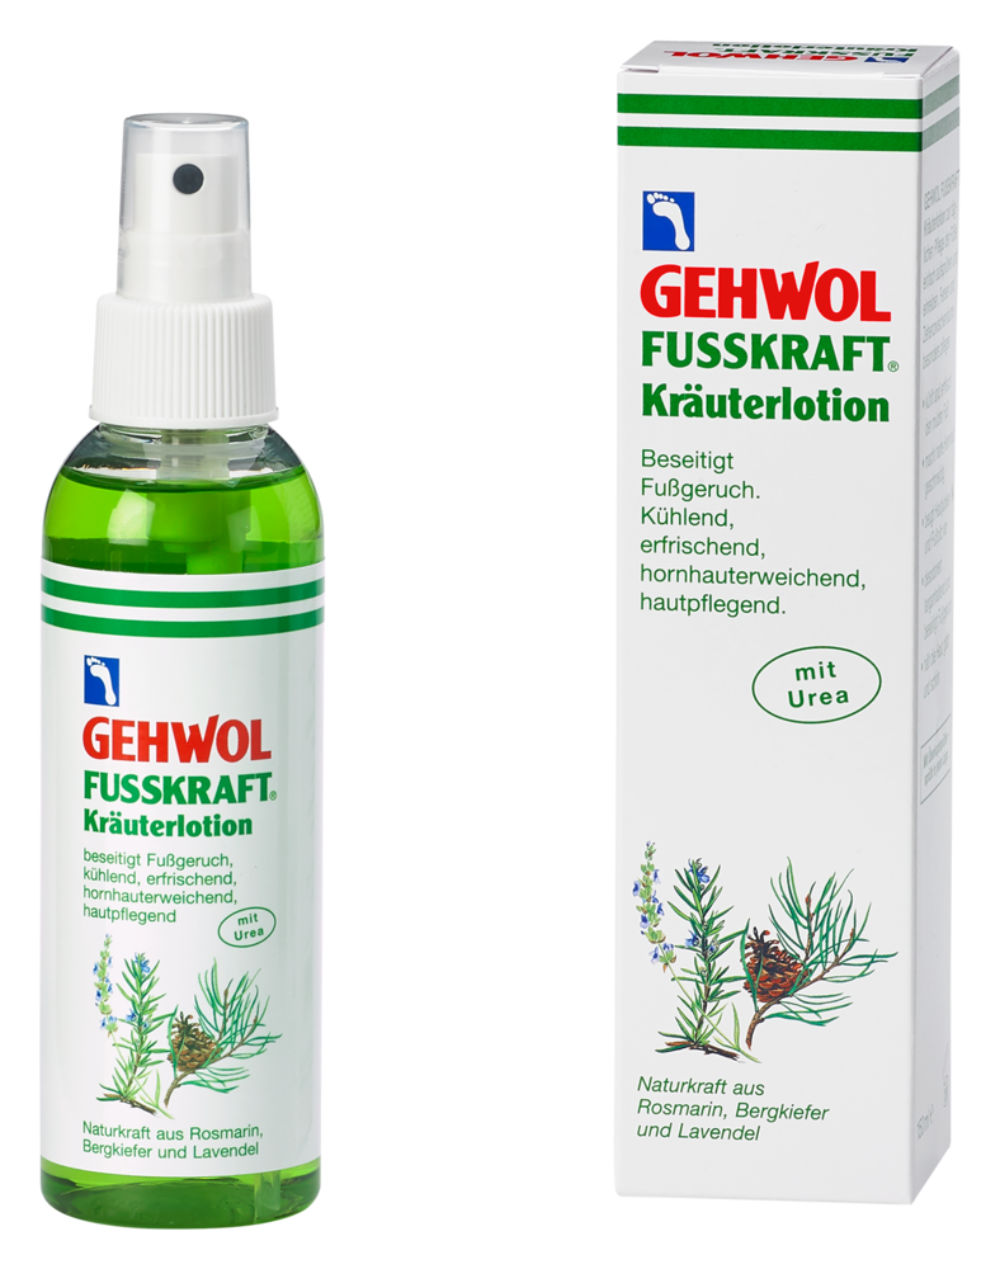 GEHWOL FUSSKRAFT® Kräuterlotion - 150 ml